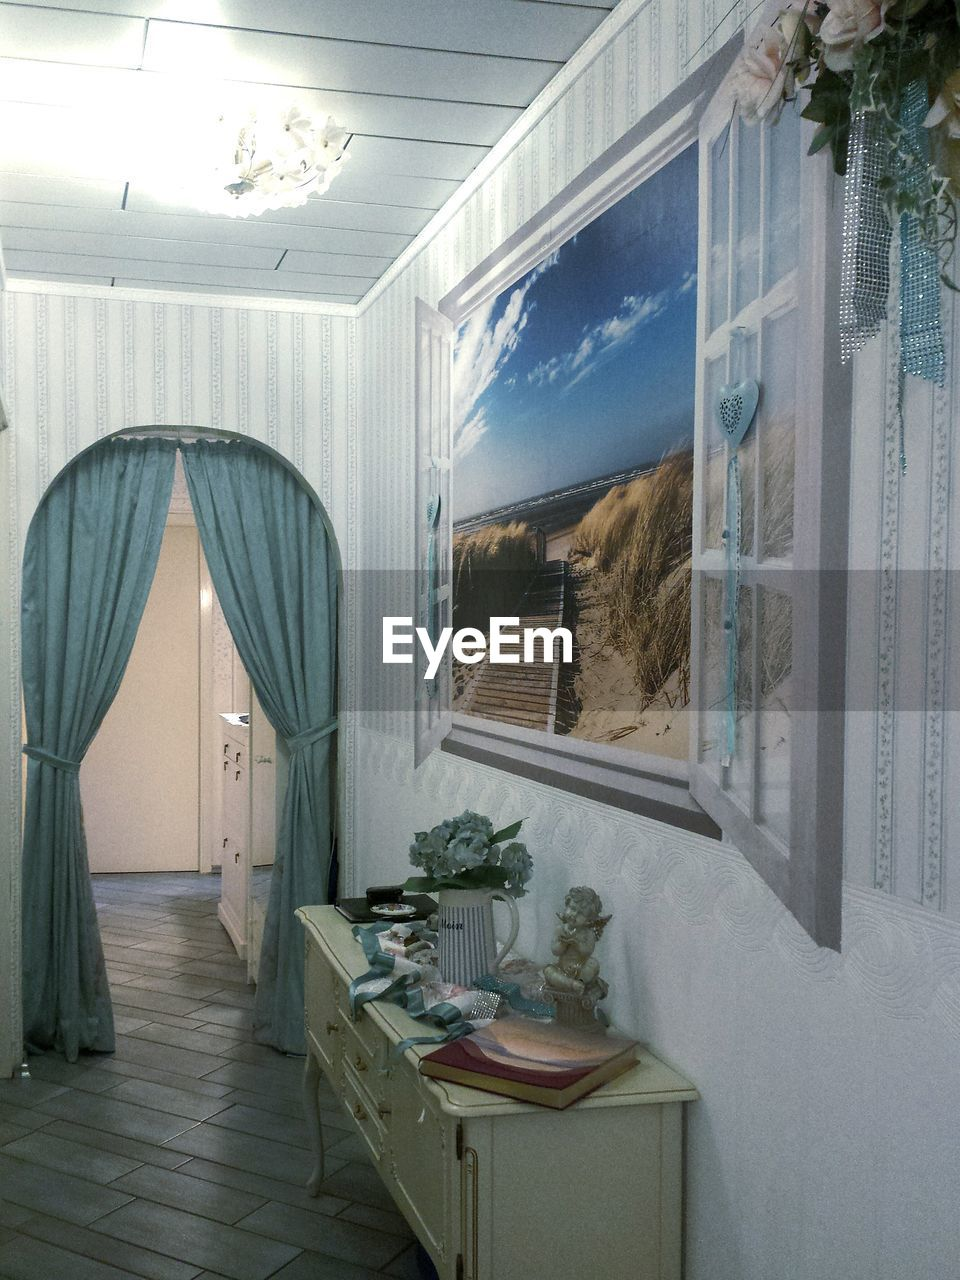 indoors, curtain, window, home interior, door, no people, plant, drapes, day, open door, home showcase interior, architecture, nature, bedroom, sky